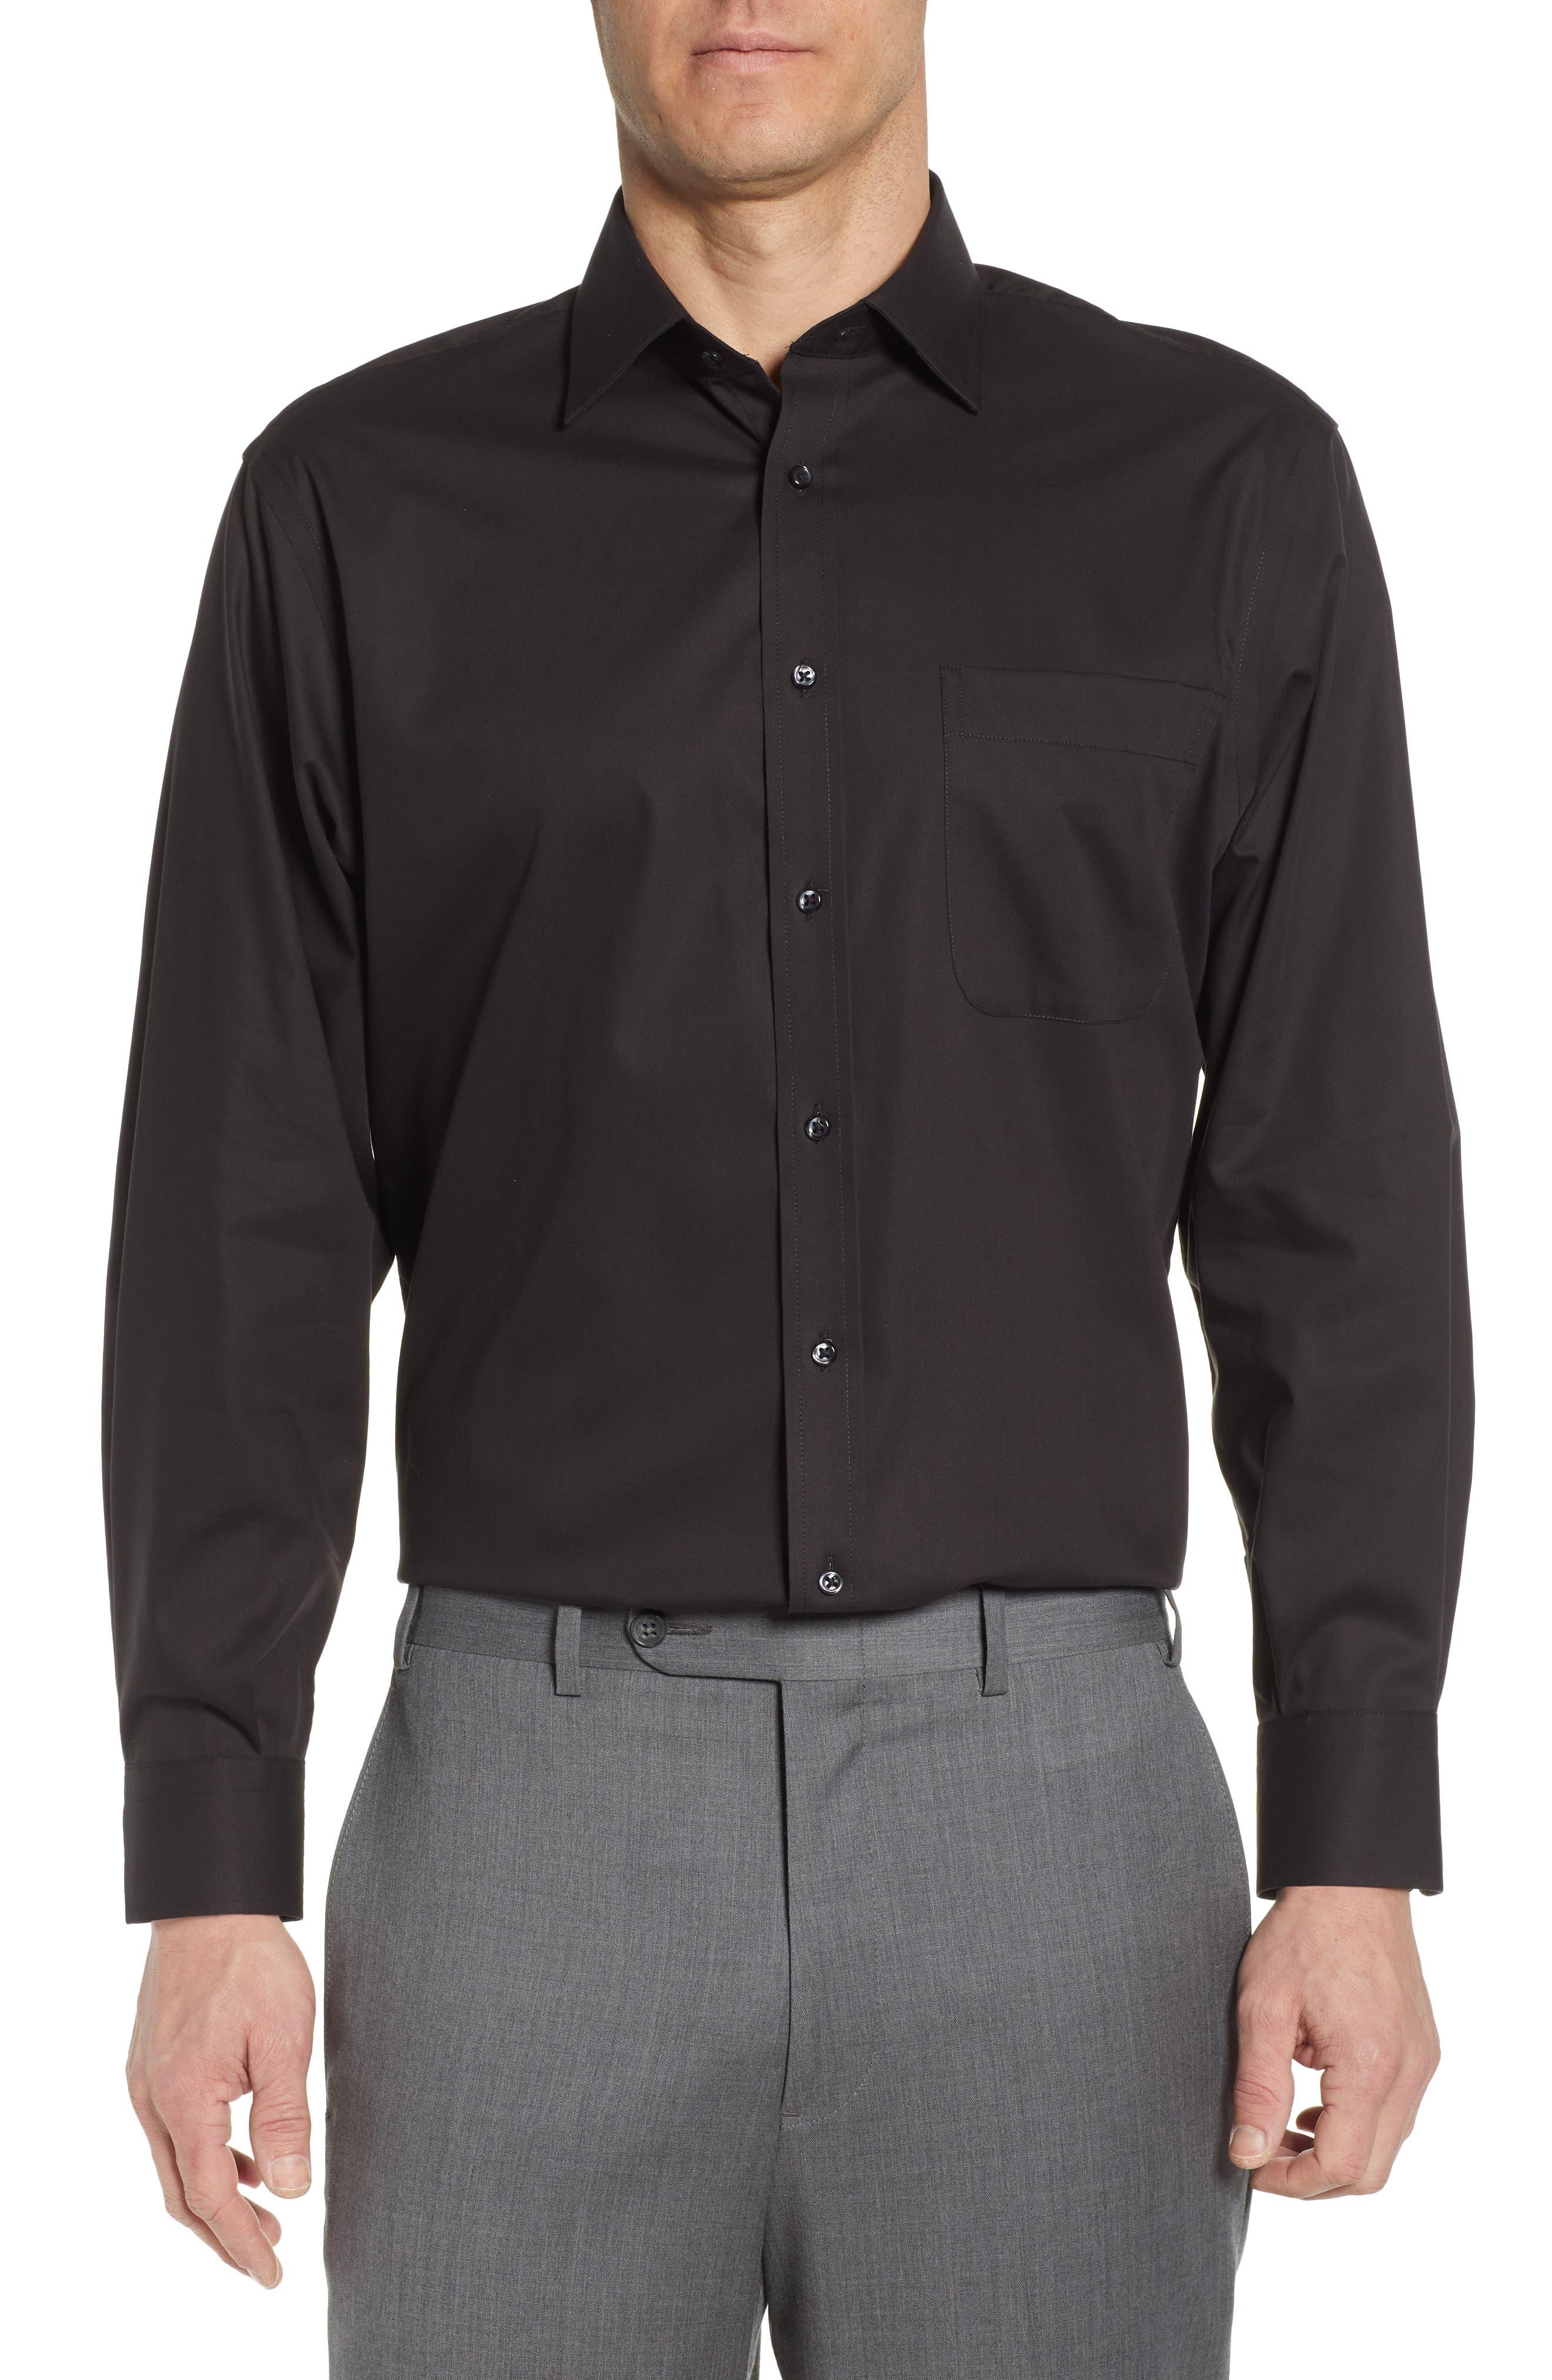 NORDSTROM MEN'S SHOP, Classic Fit Non-Iron Dress Shirt, Main thumbnail 1, color, BLACK